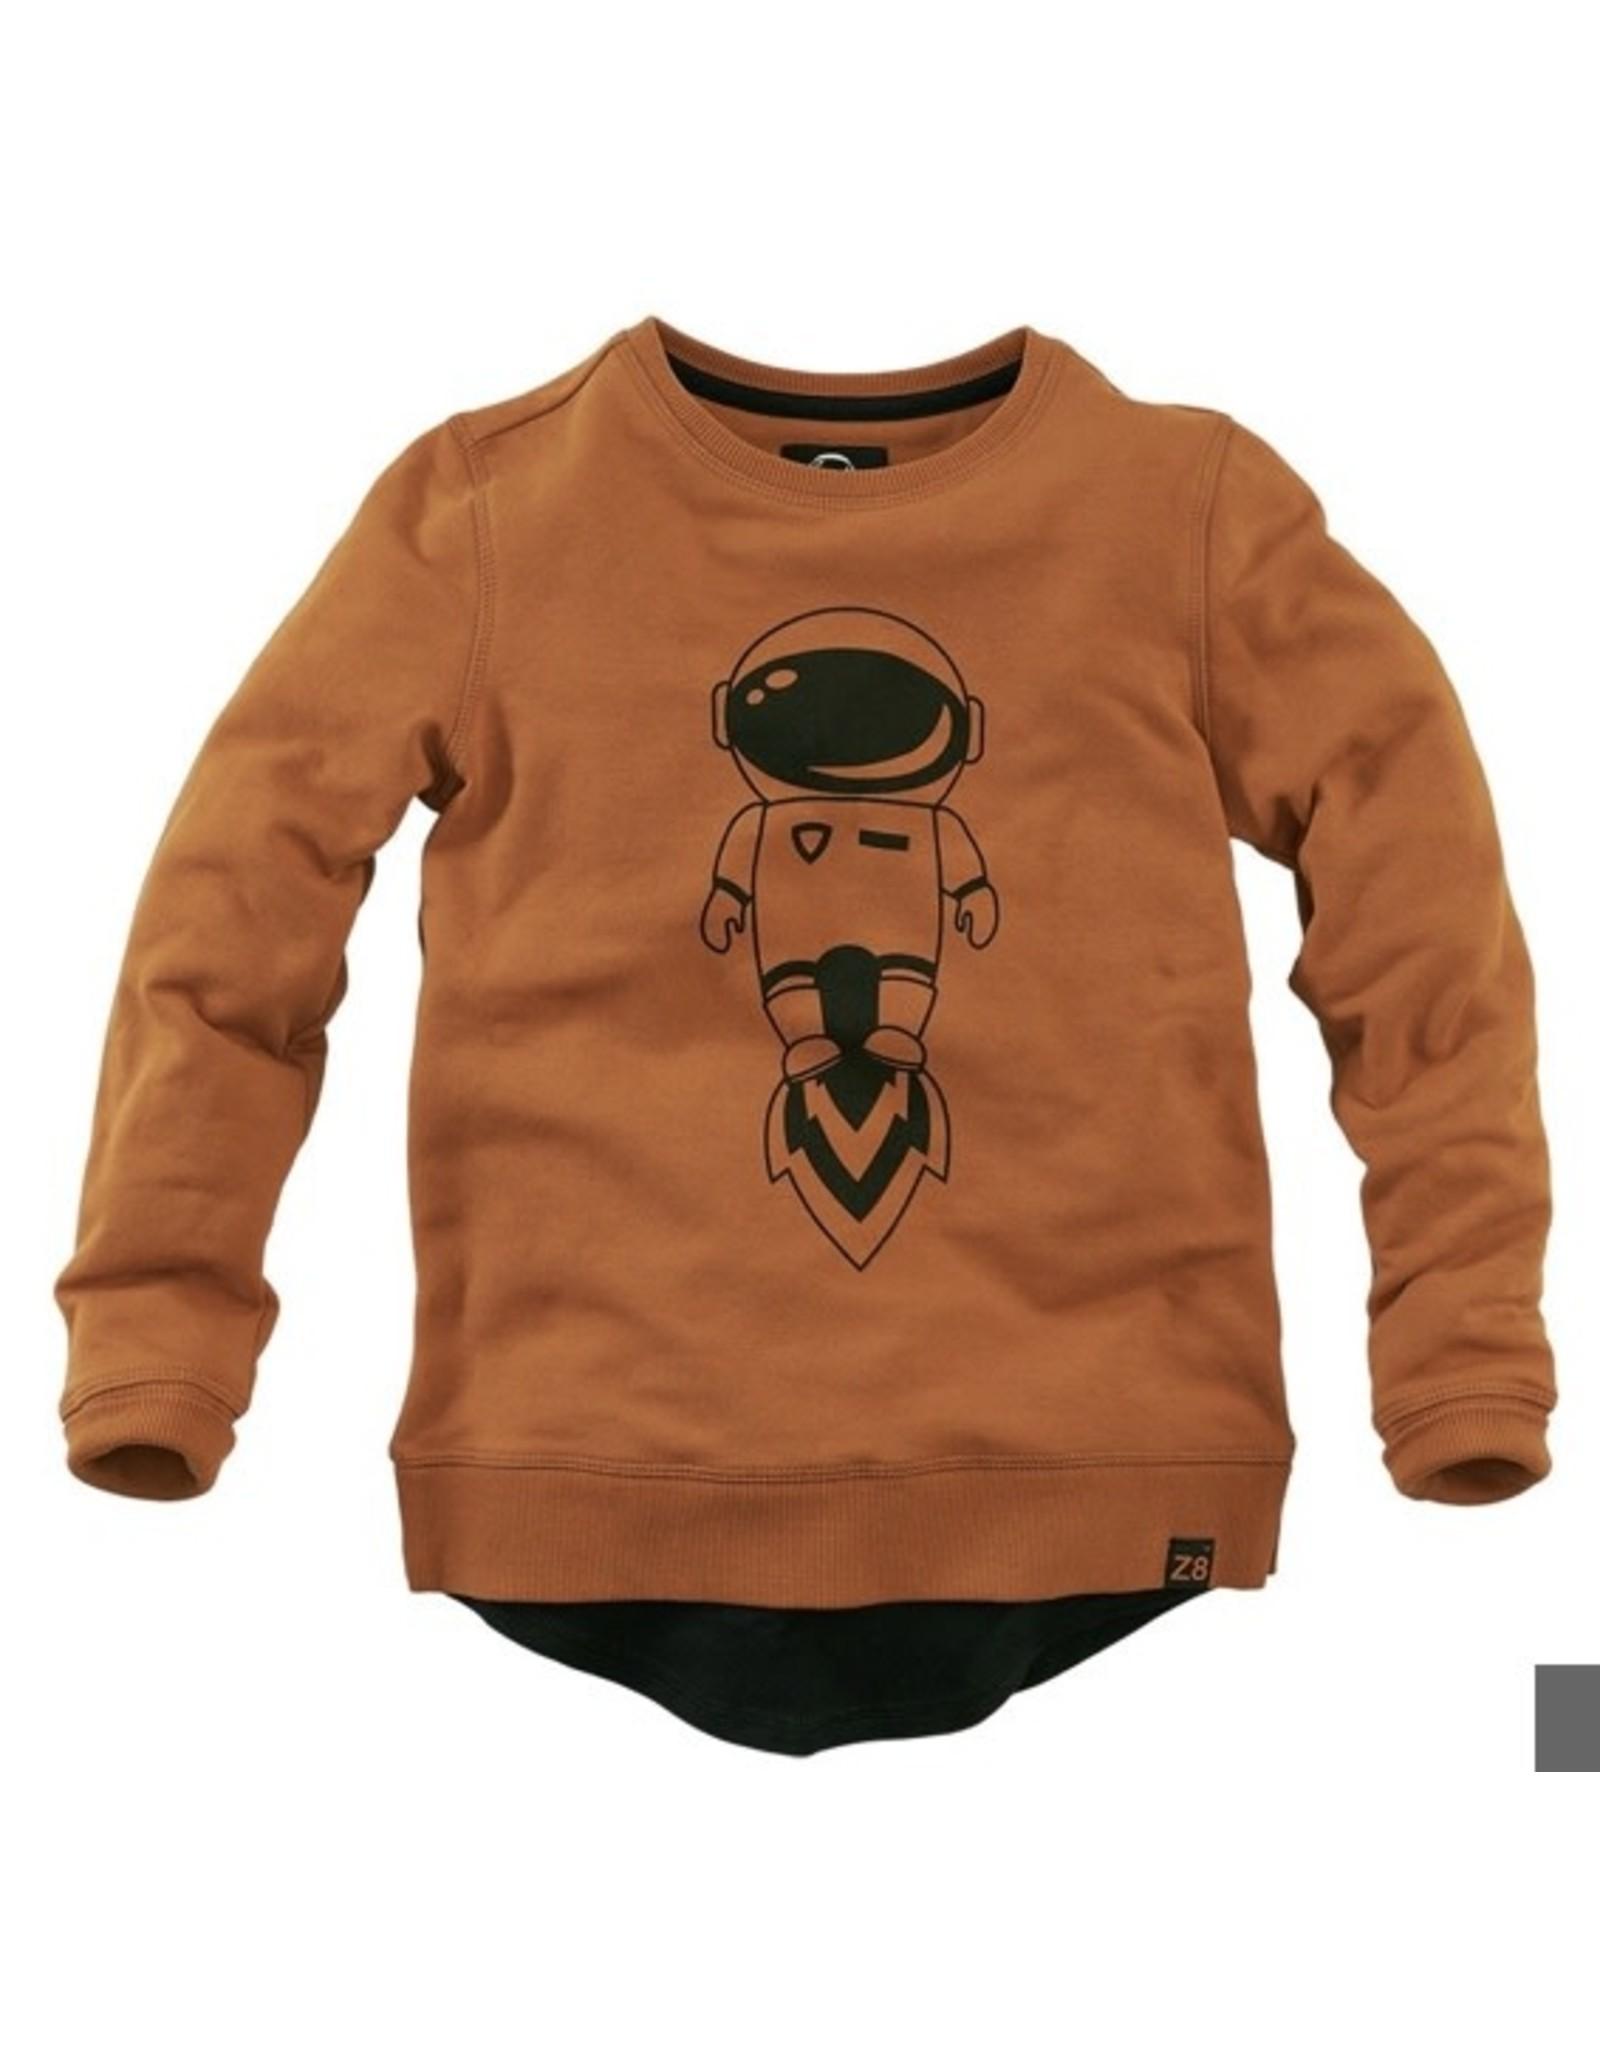 Z8 Patrick sweater